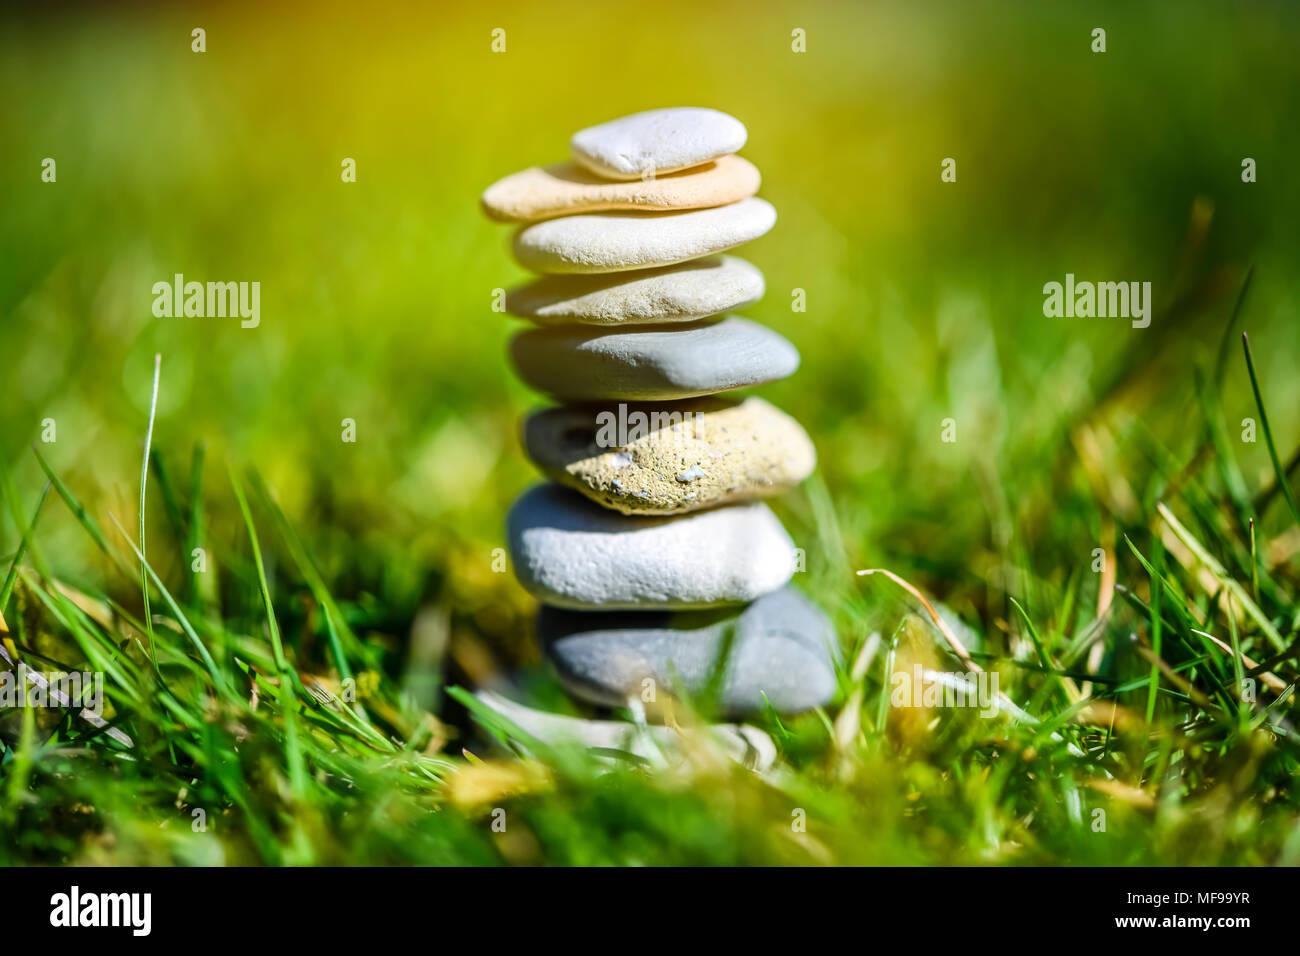 Stacked stones, harmony, balance - Stock Image